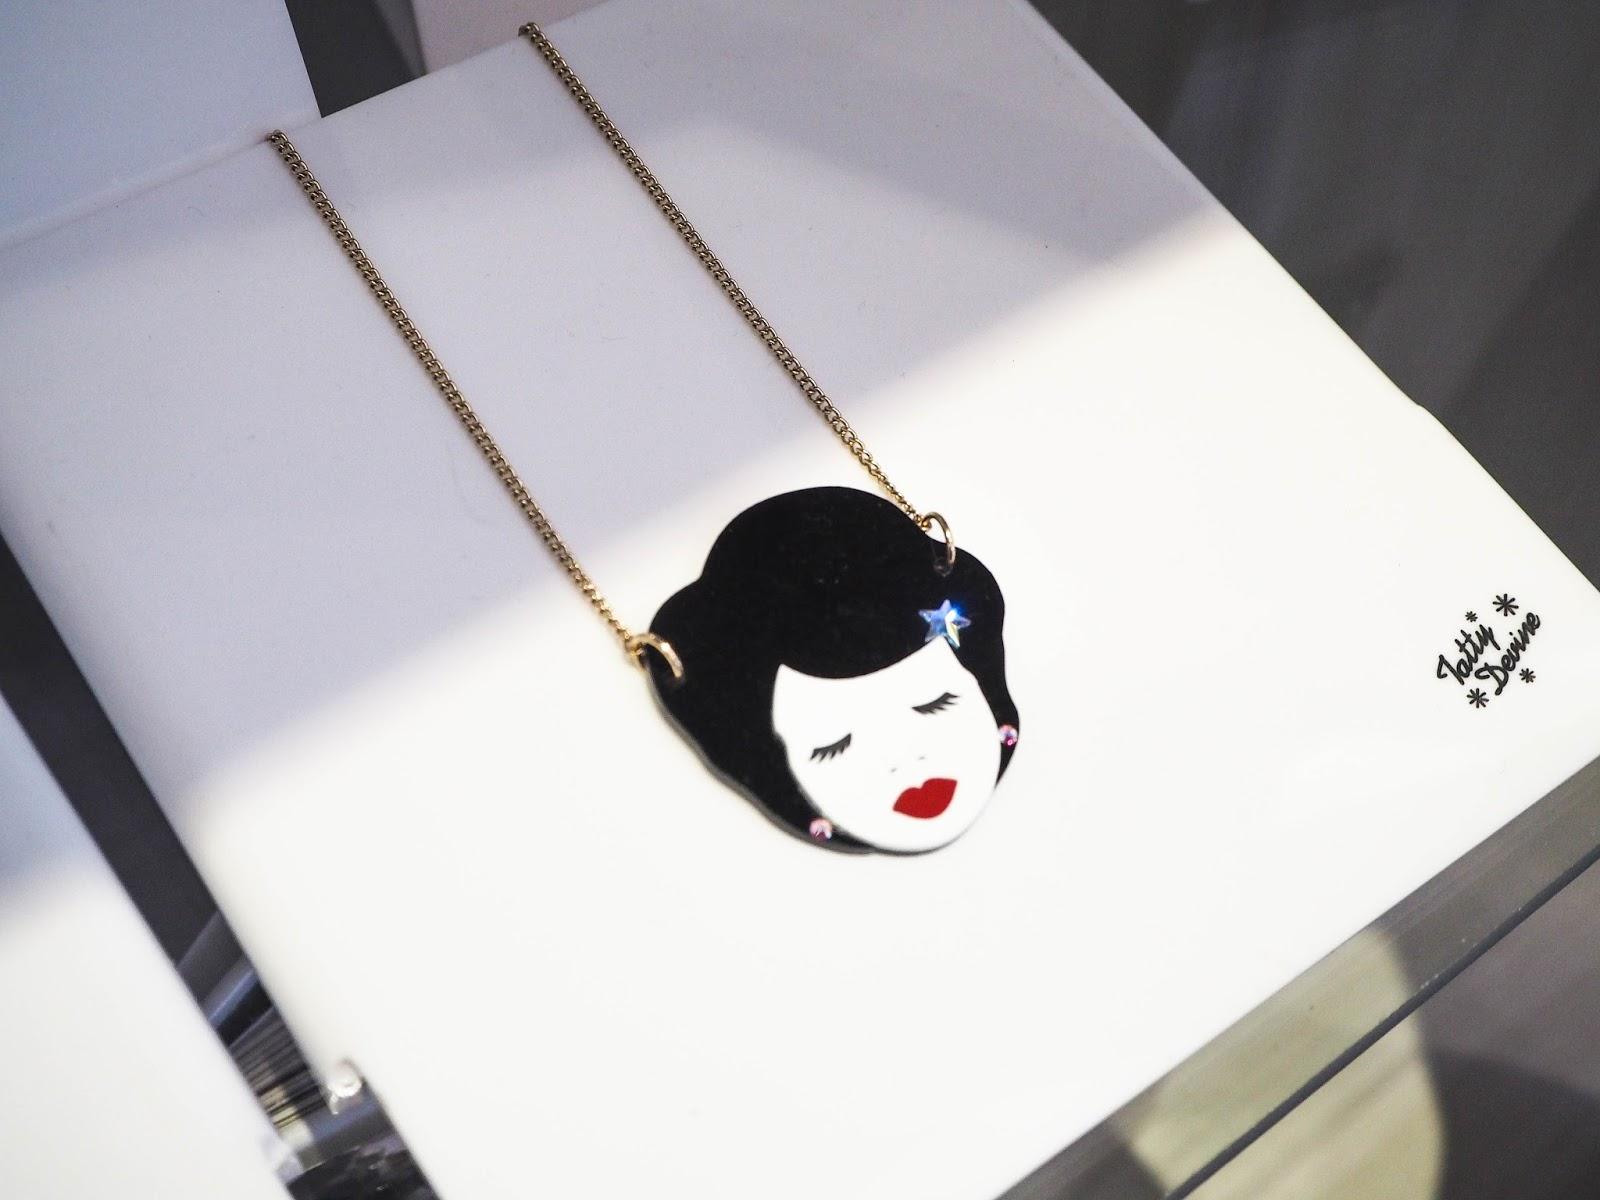 Tatty Devine virgo horoscope collection necklace